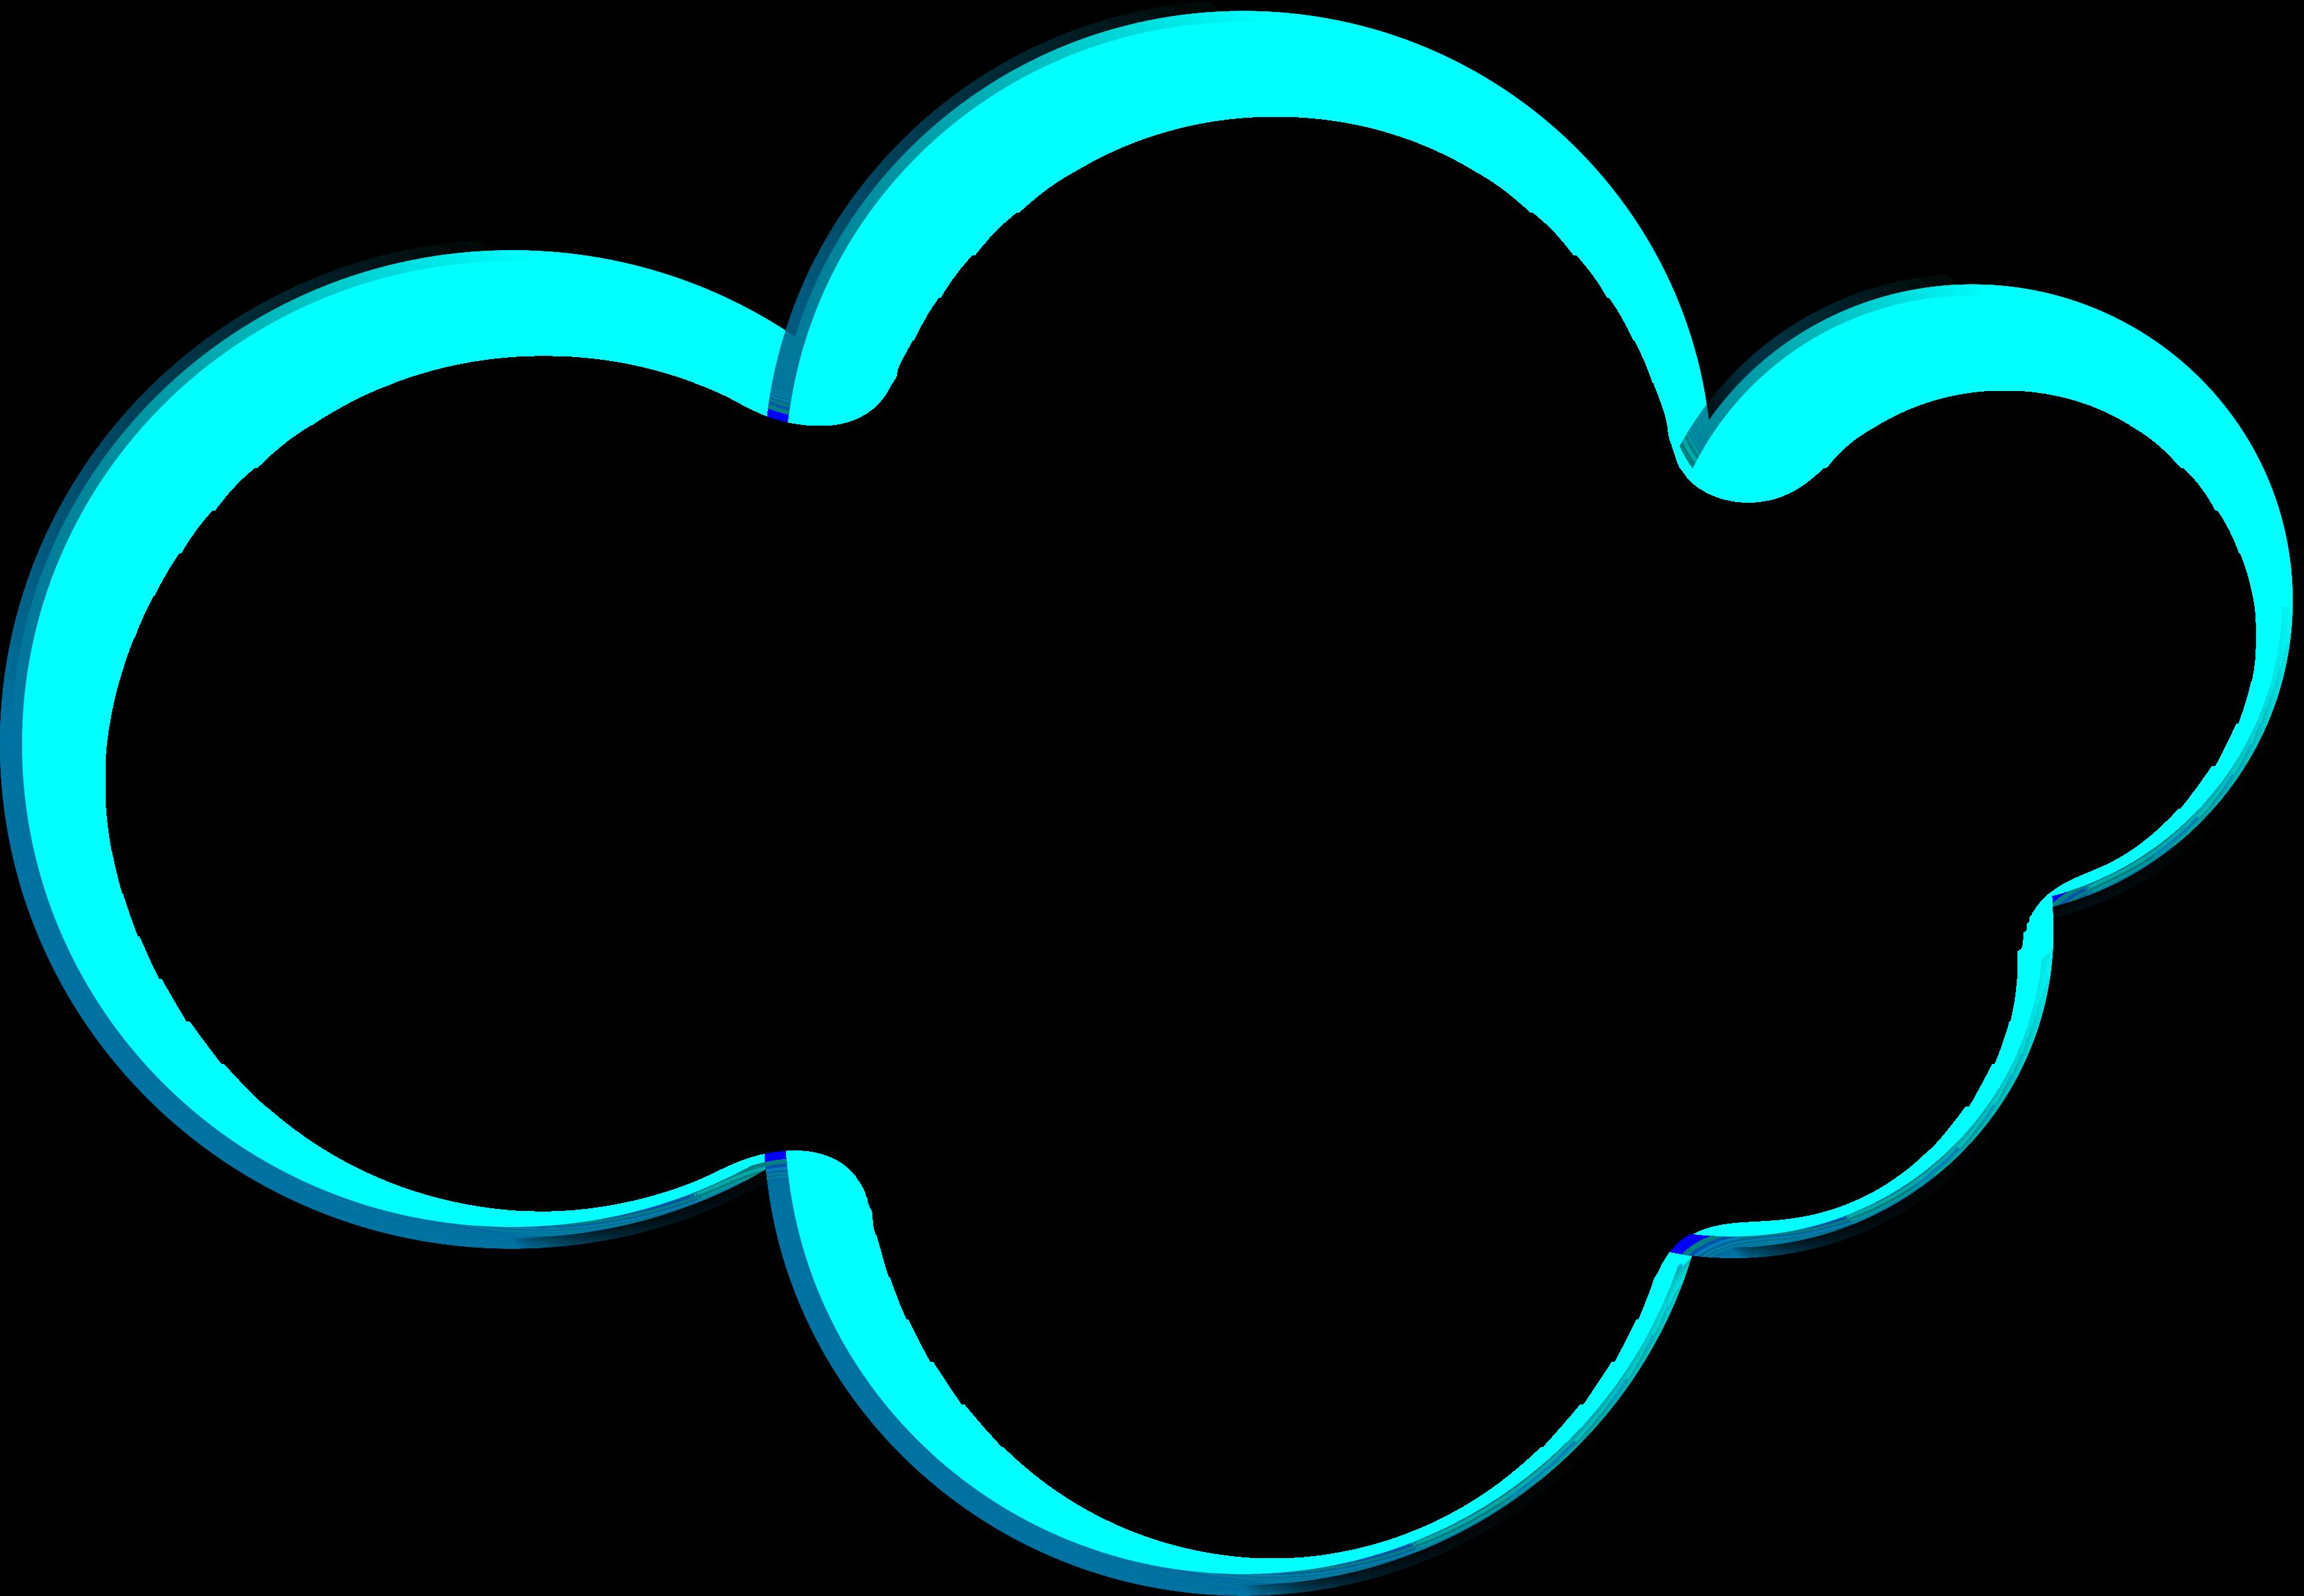 Big image png. Fight clipart cloud